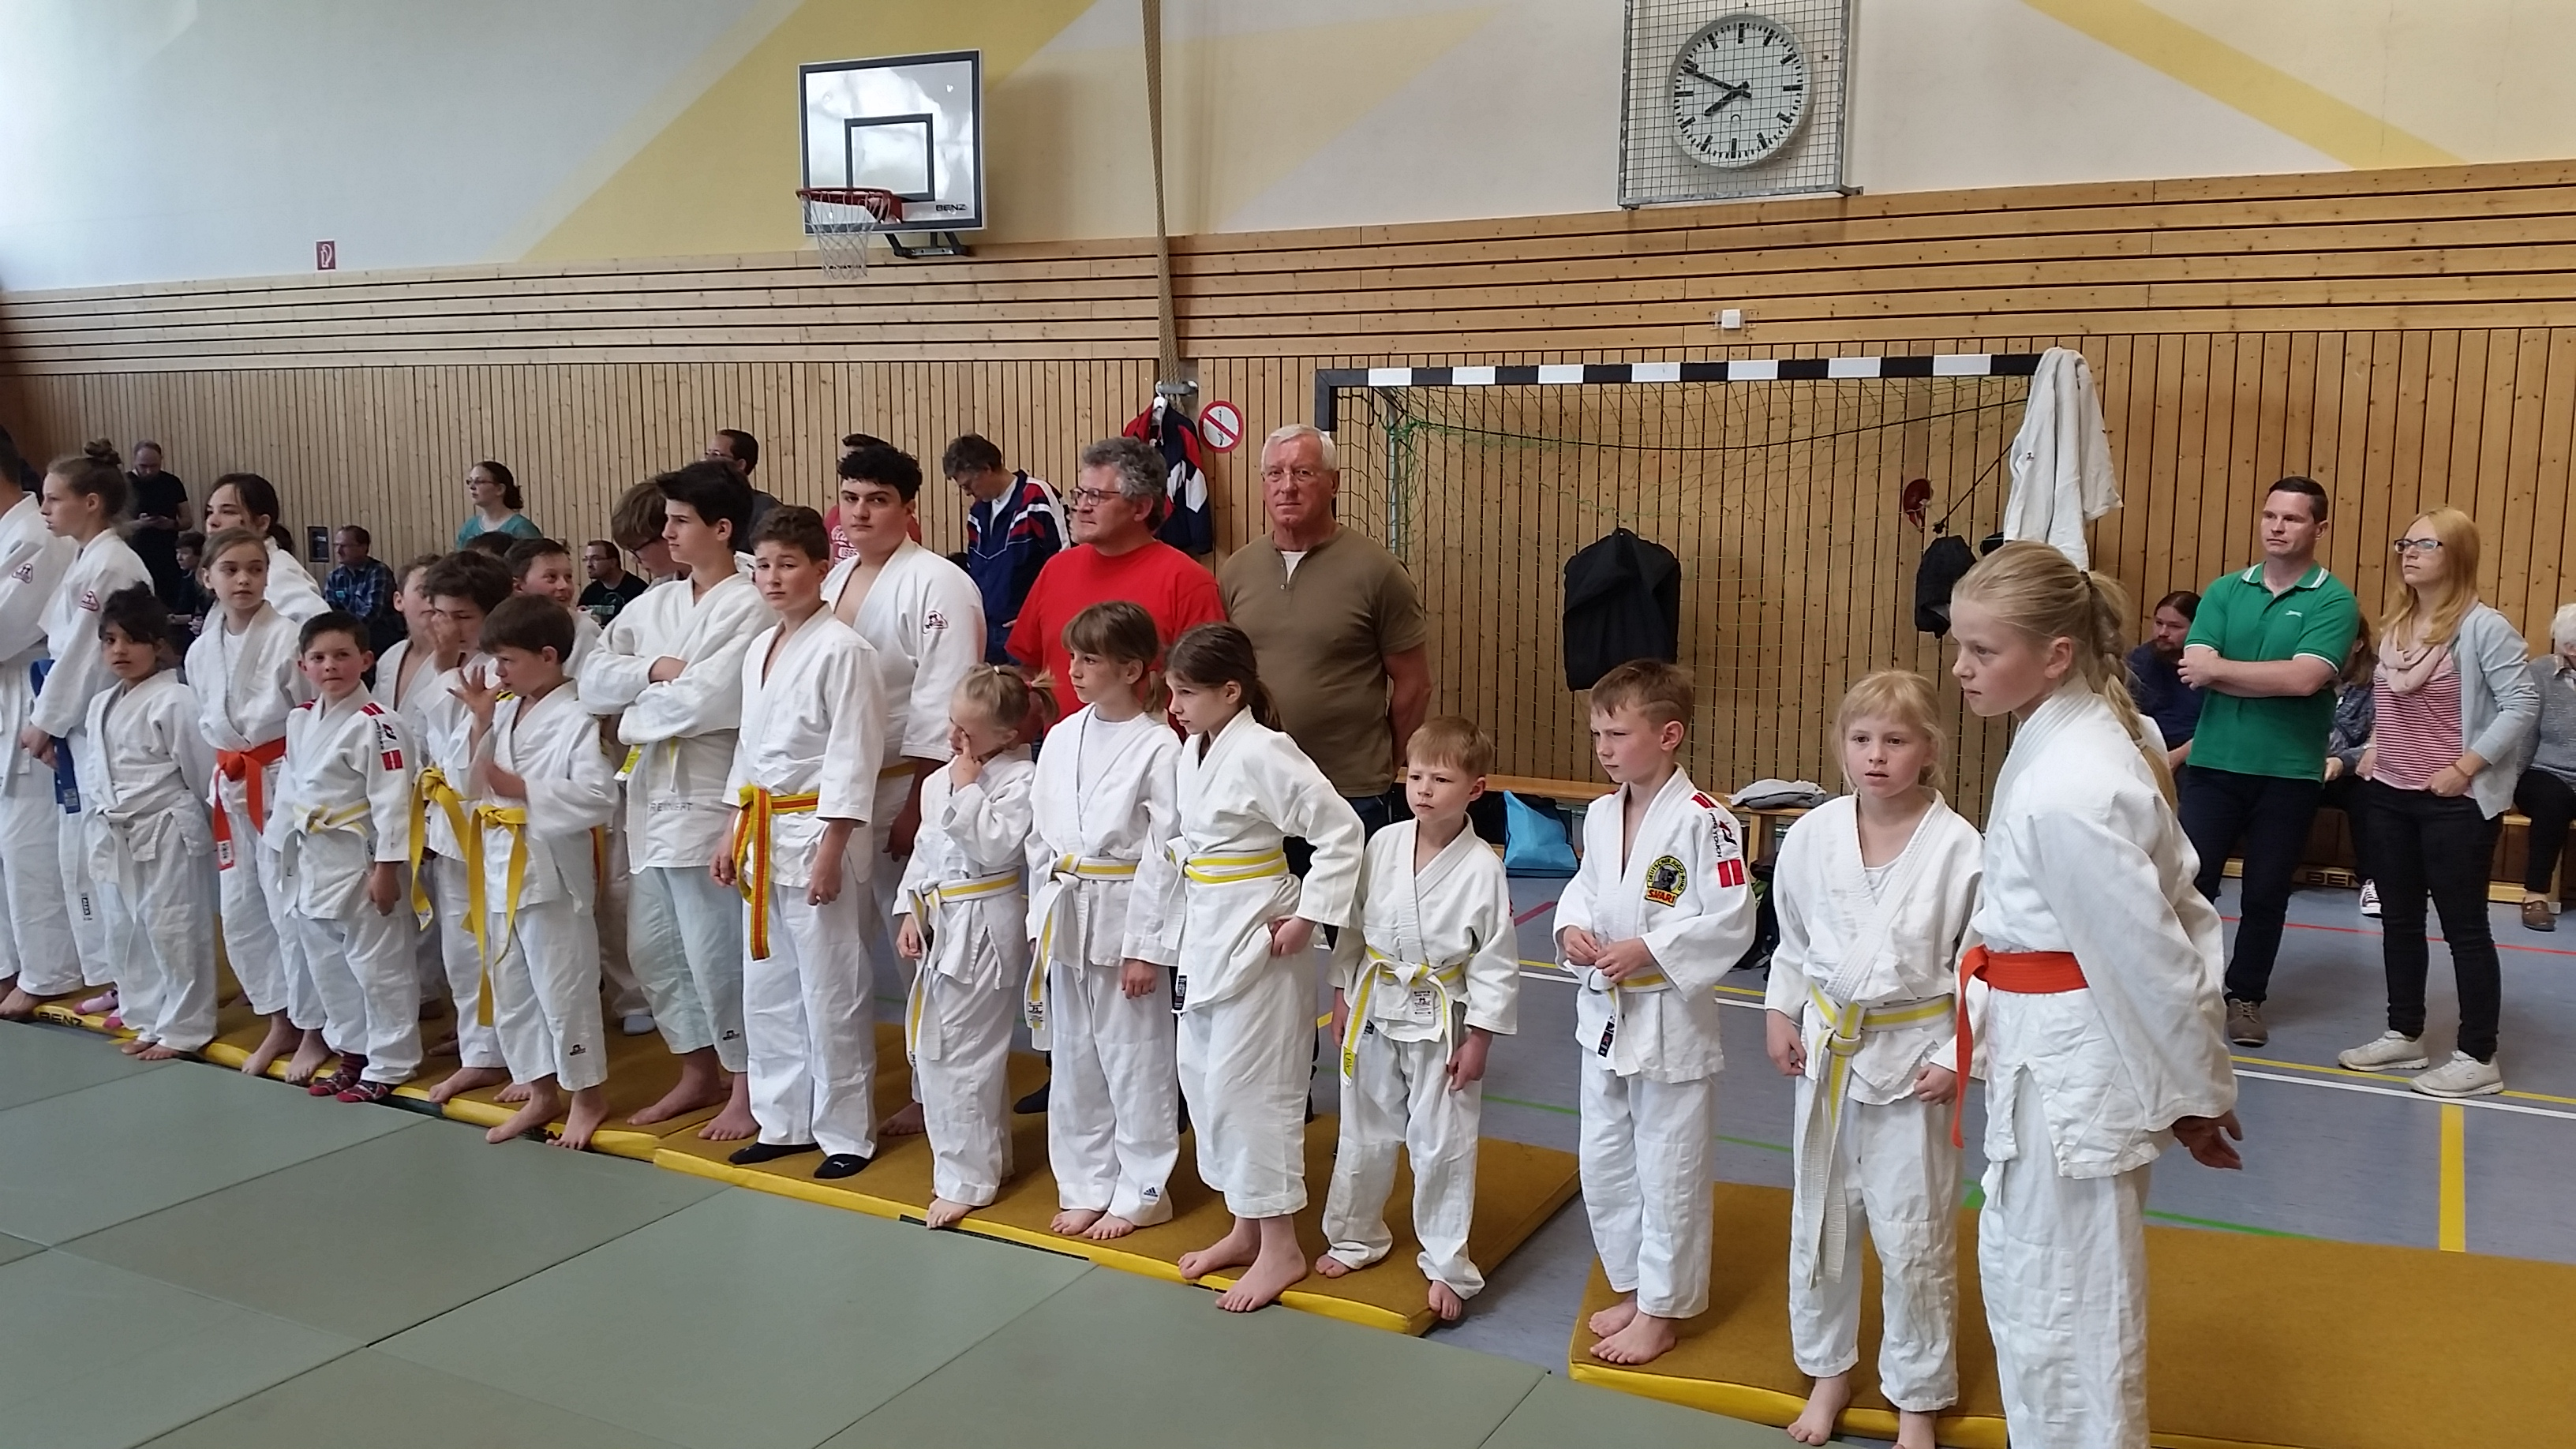 Judo Kreisjugendspiele 2018